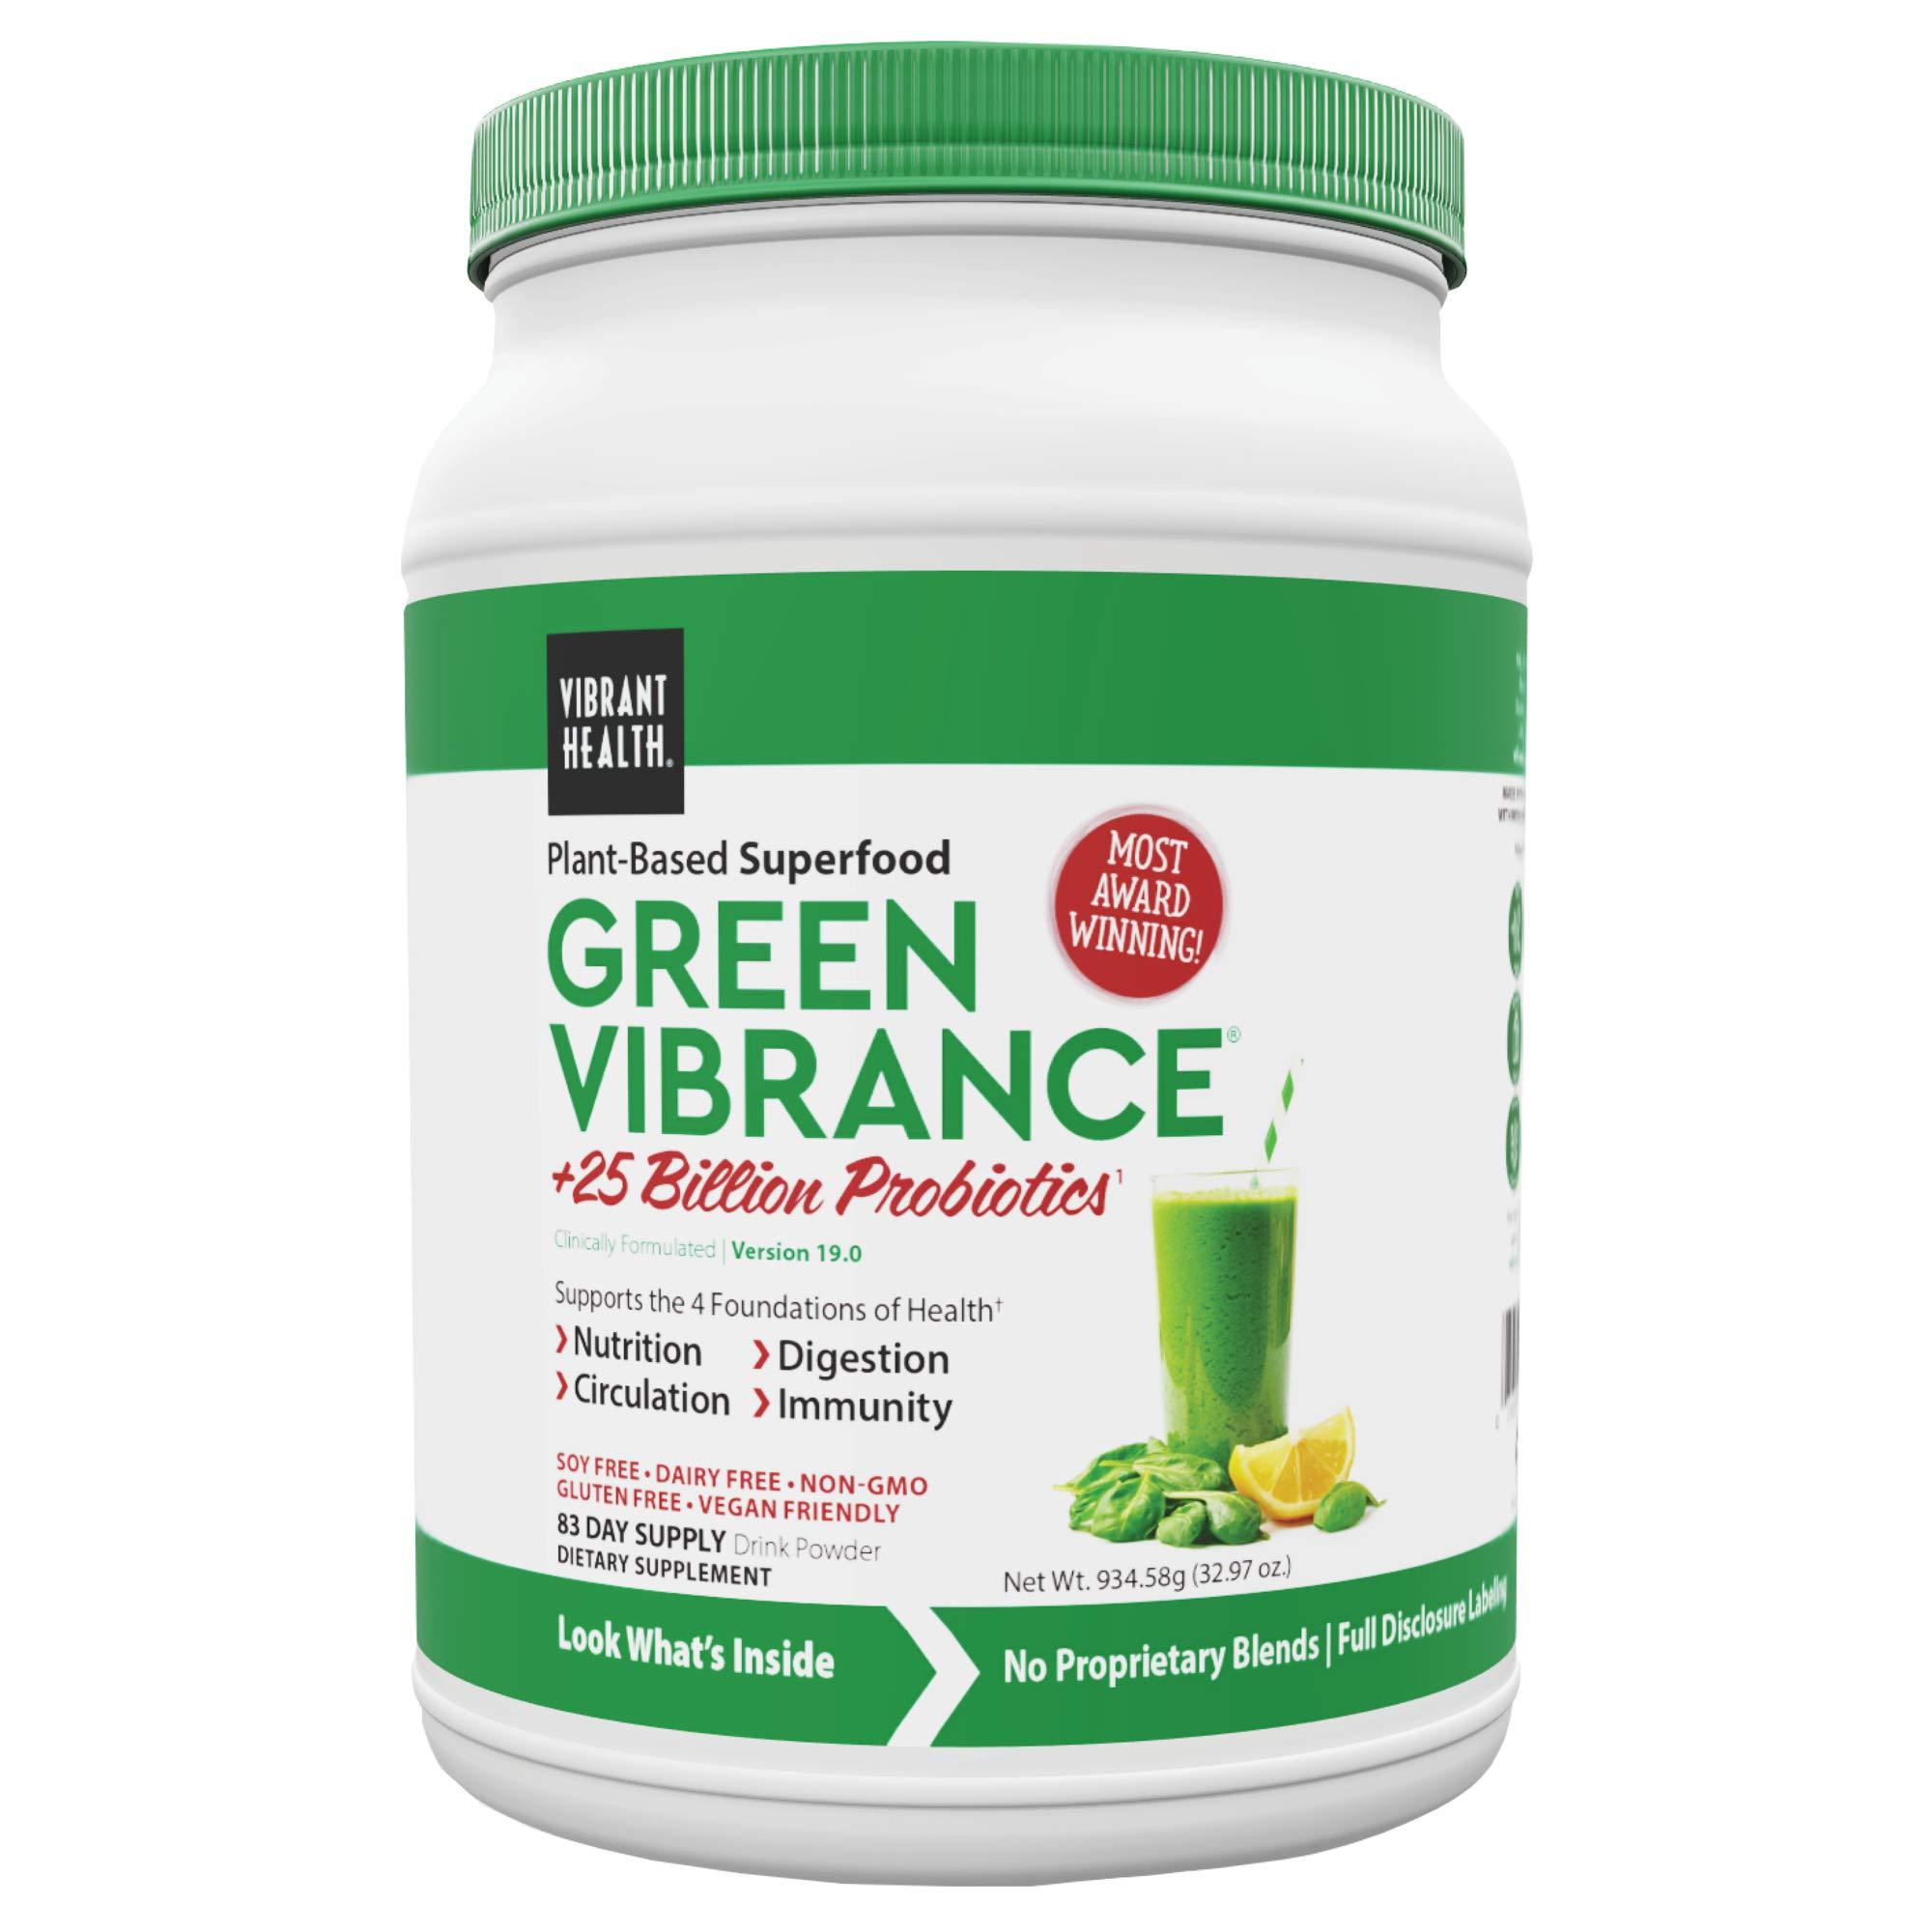 Vibrant Health, Green Vibrance, Plant-Based Superfood Powder, 25 Billion Probiotics Per Scoop, Vegan Friendly, 83 Servings (FFP)